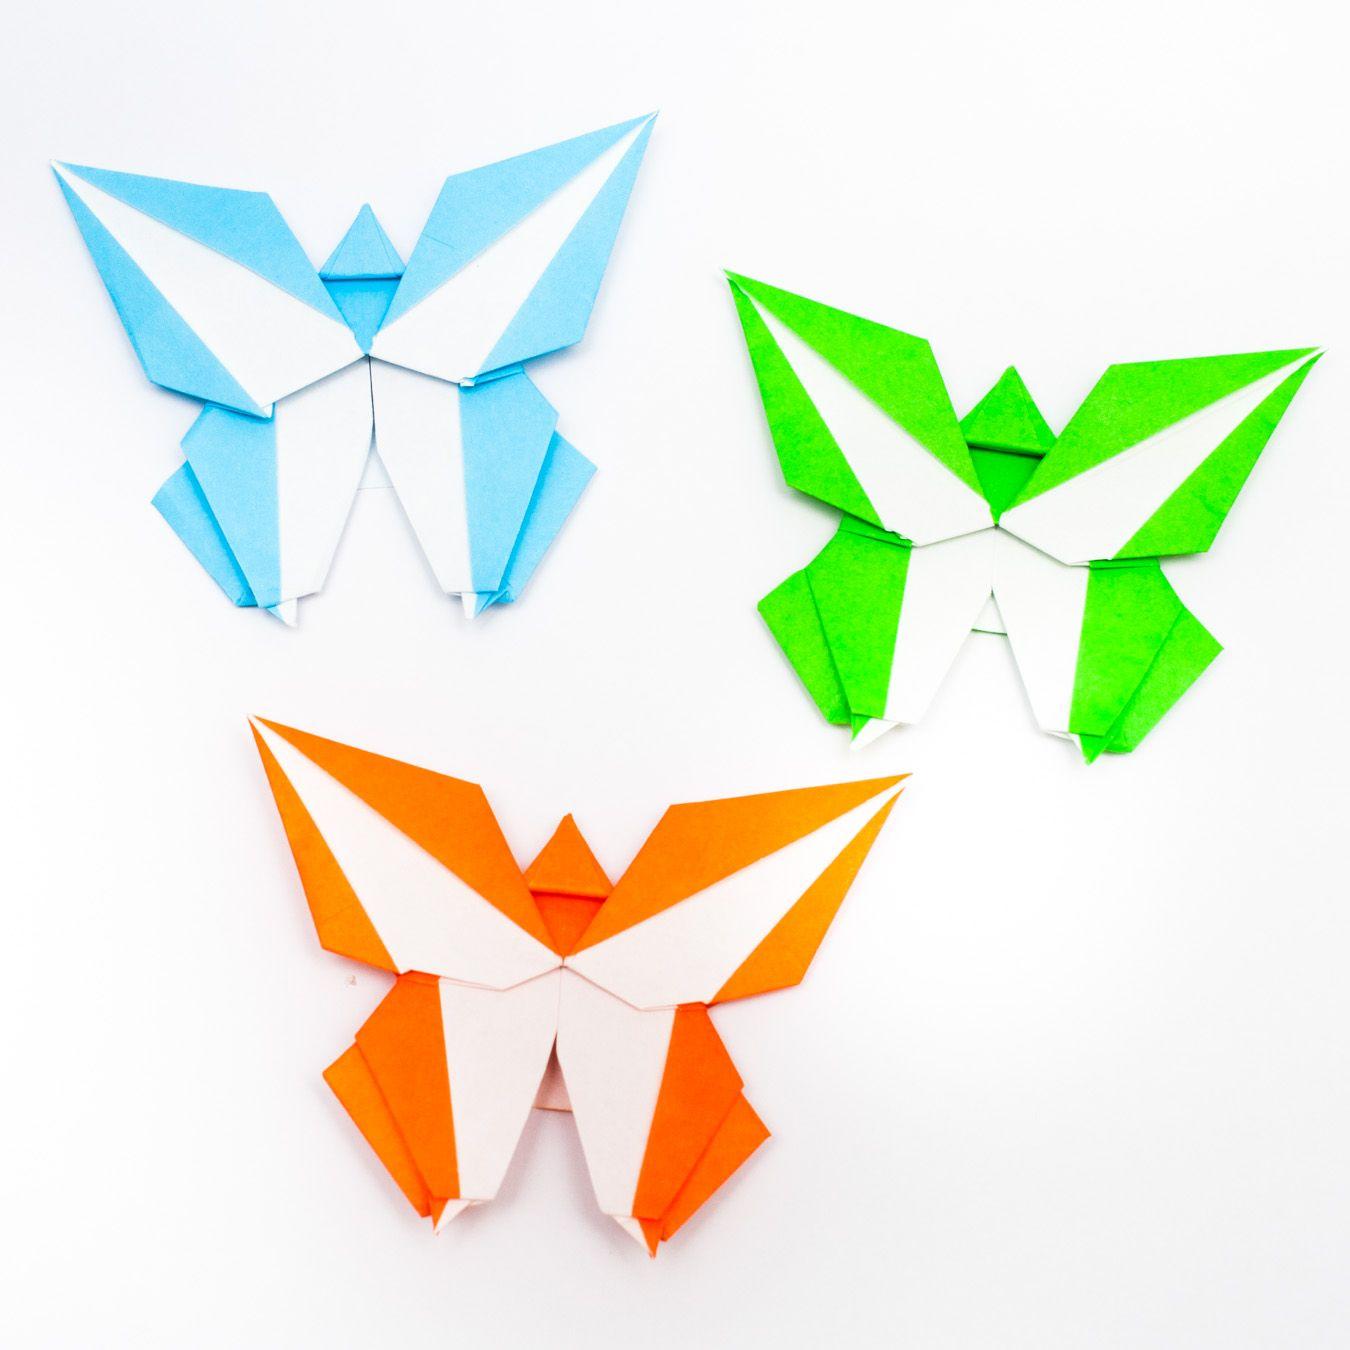 Origami Butterfly Bookmark - วิธีพับกระดาษเป็นที่คั่น ... - photo#12